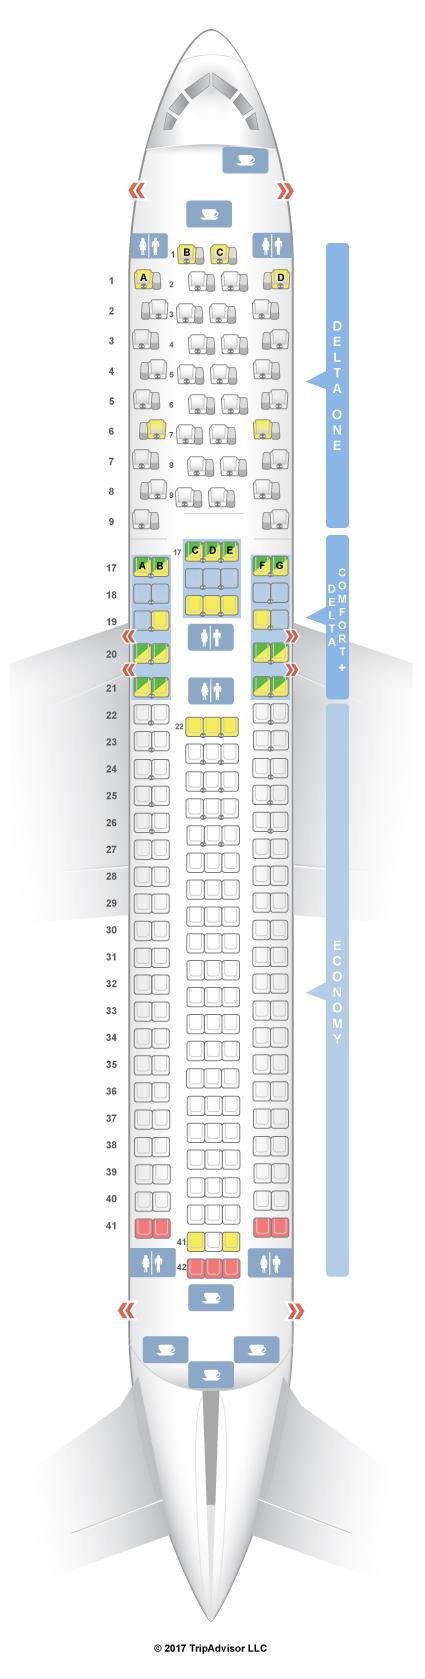 Boeing 737 900 Seating Chart Delta - Best Seat 2018